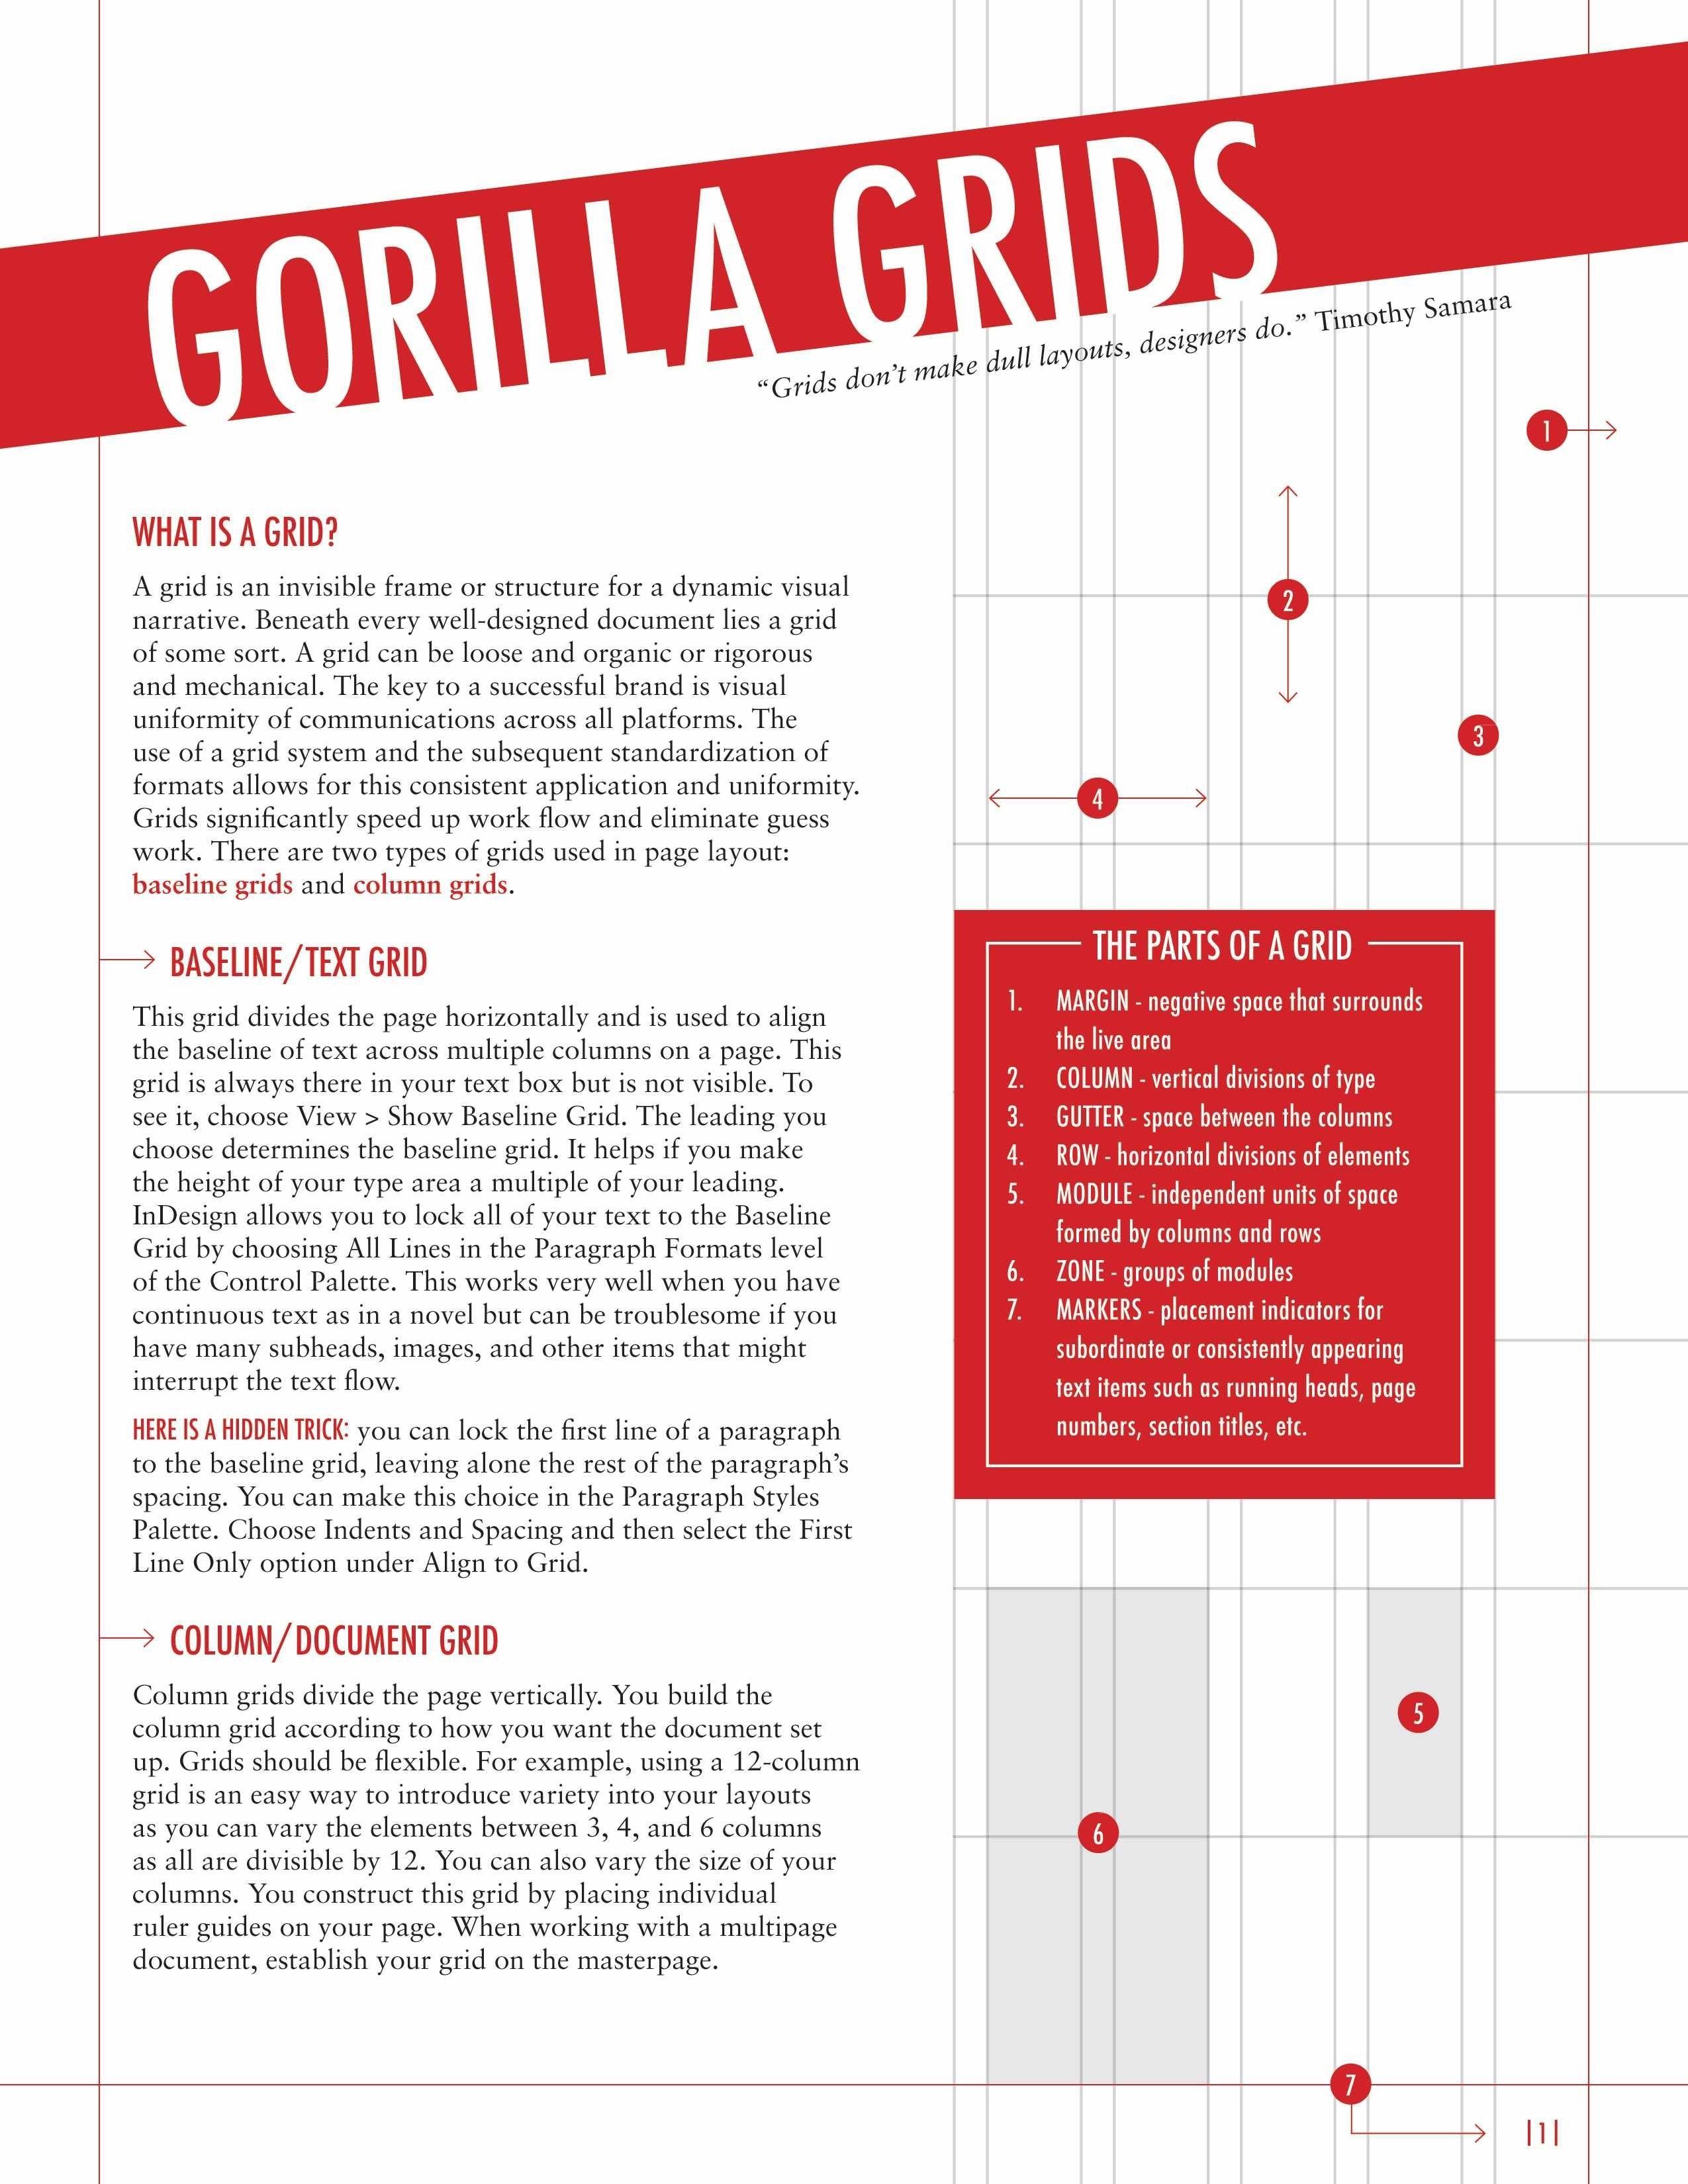 Gorilla Grids  Infographic Zone    Education